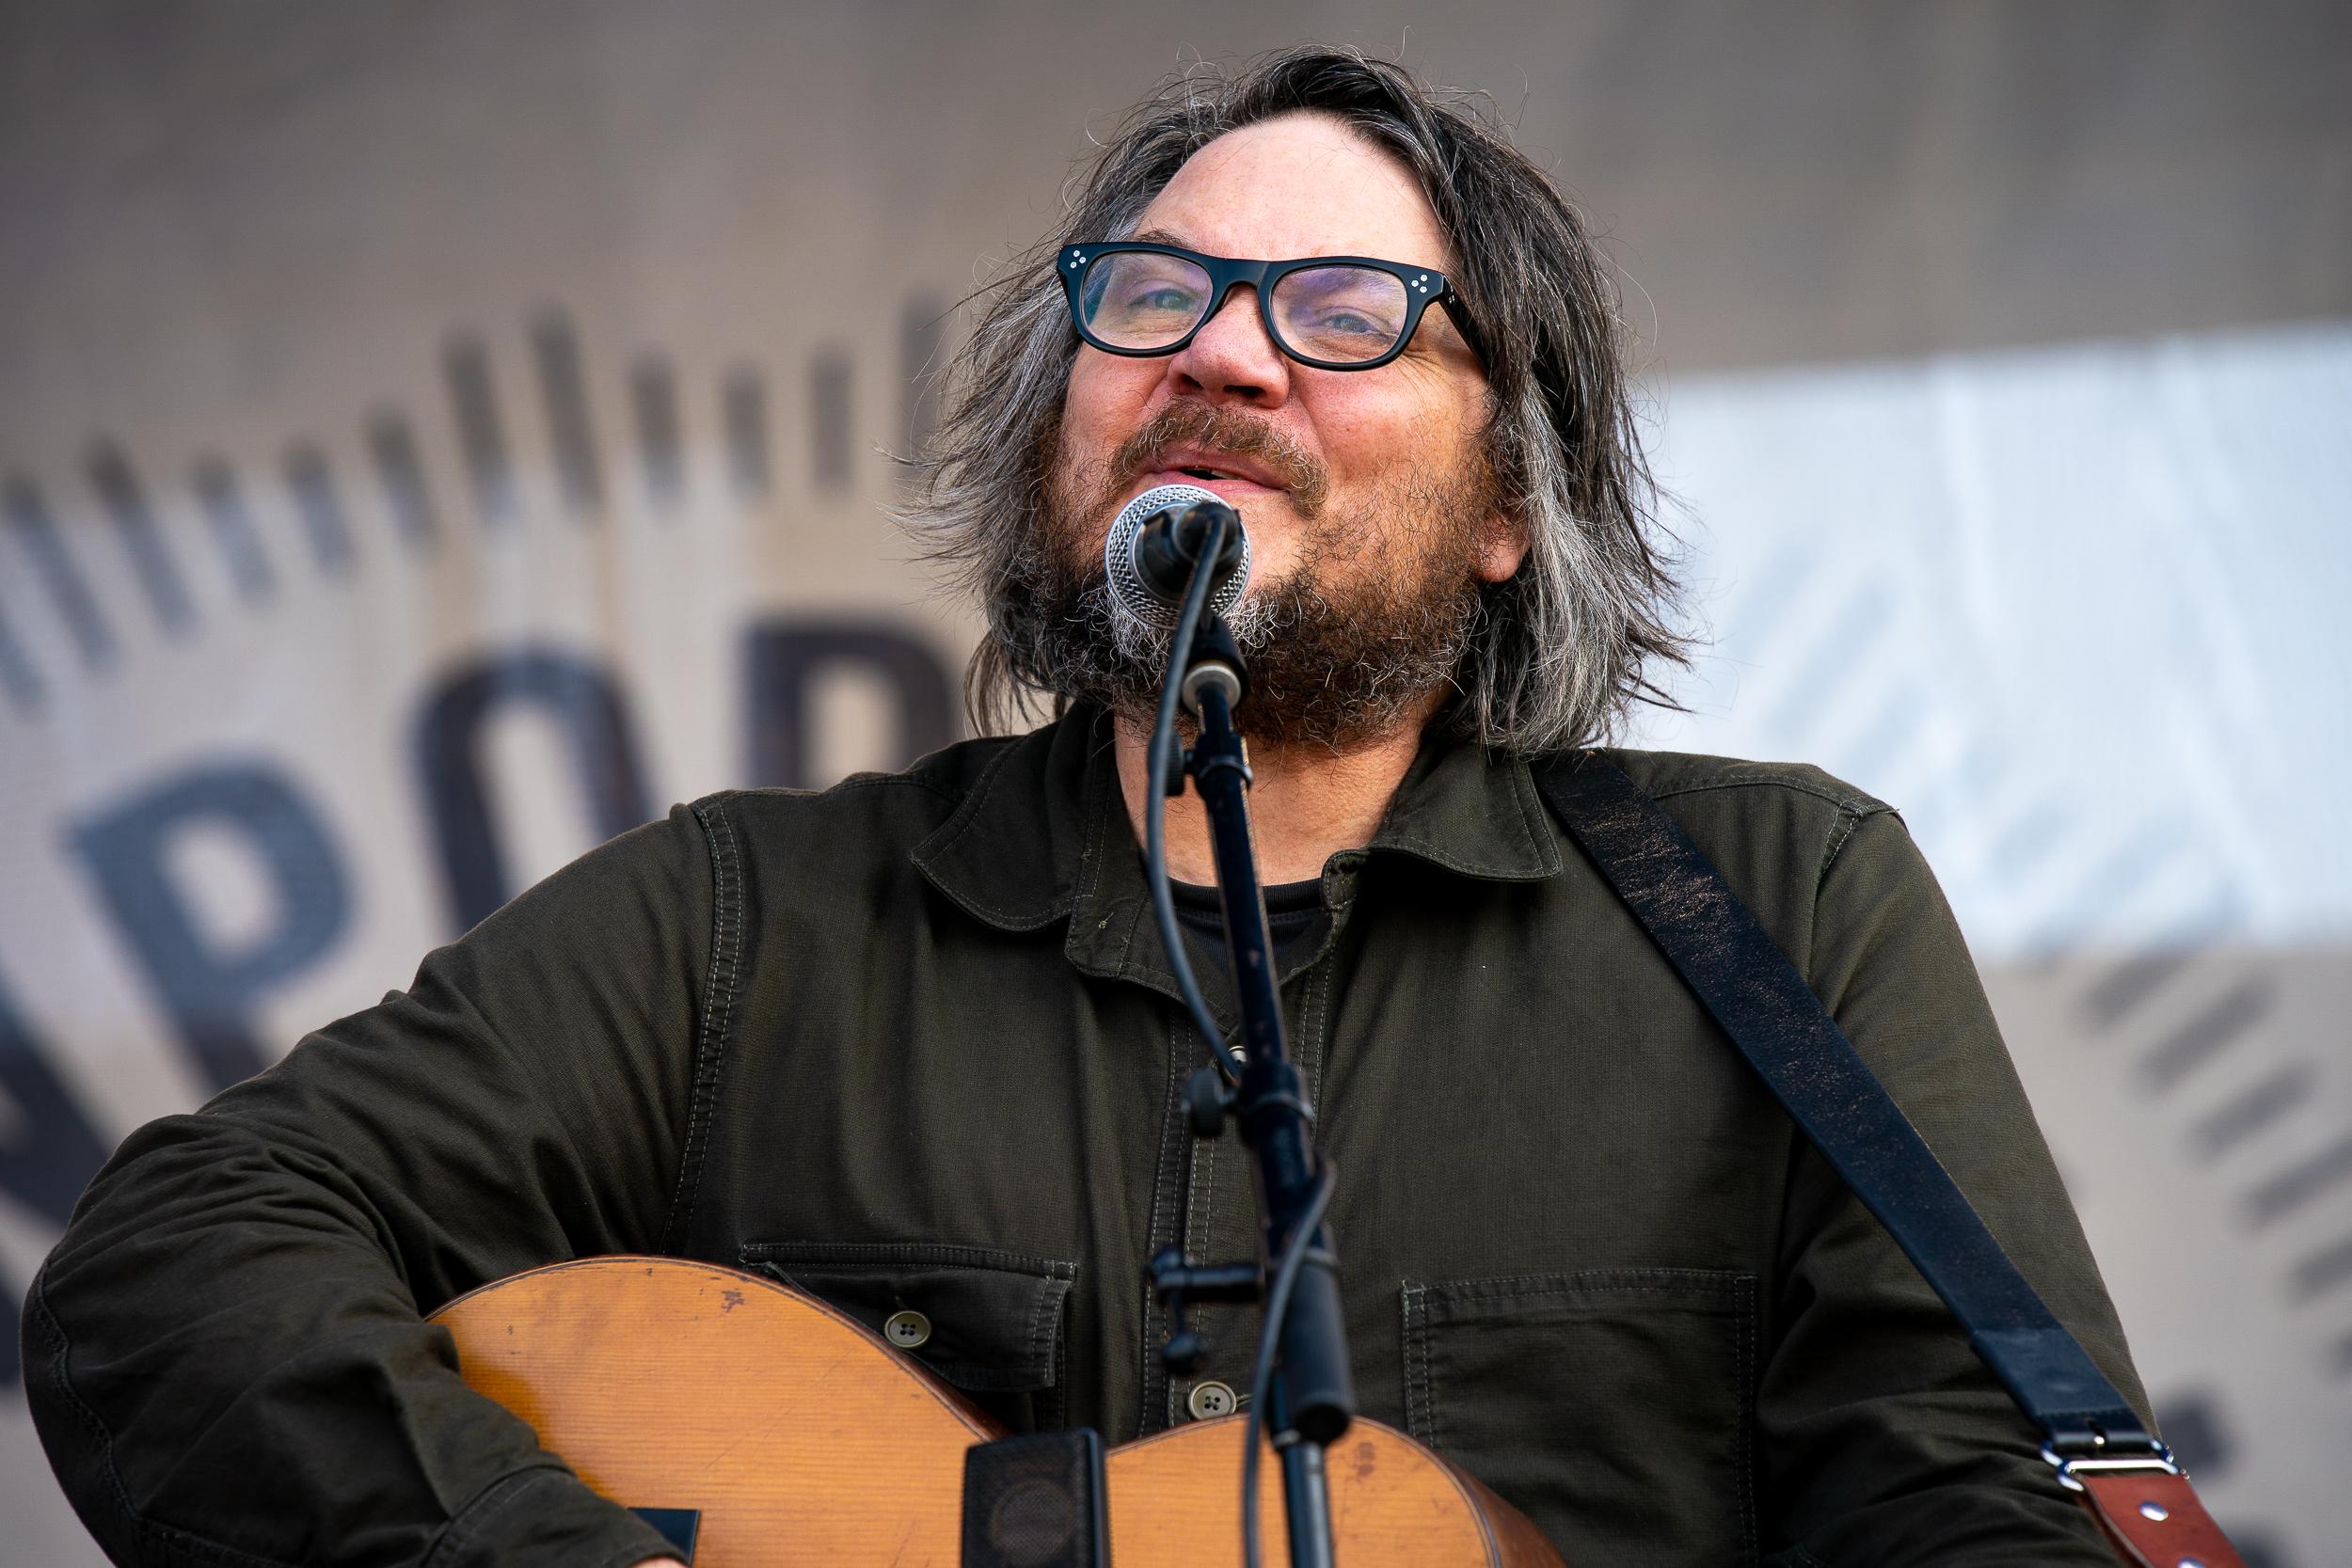 Jeff Tweedy at Newport Folk Festival (Photo by Mauricio Castro)